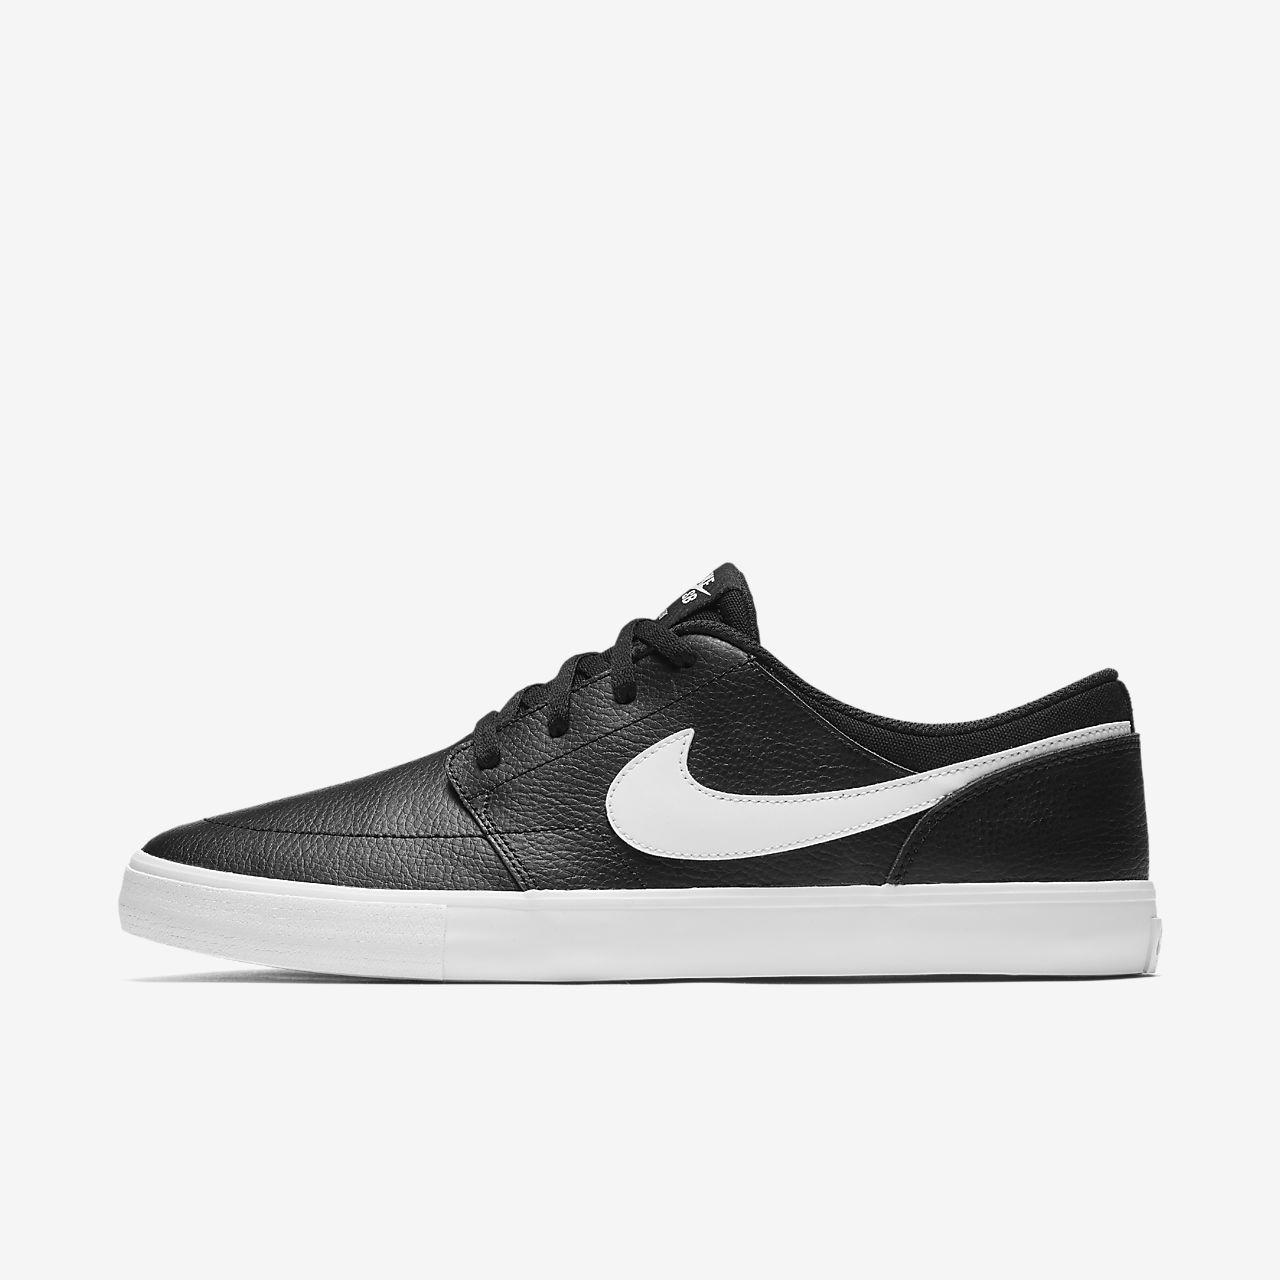 ... Nike SB Solarsoft Portmore II Premium Men's Skateboarding Shoe